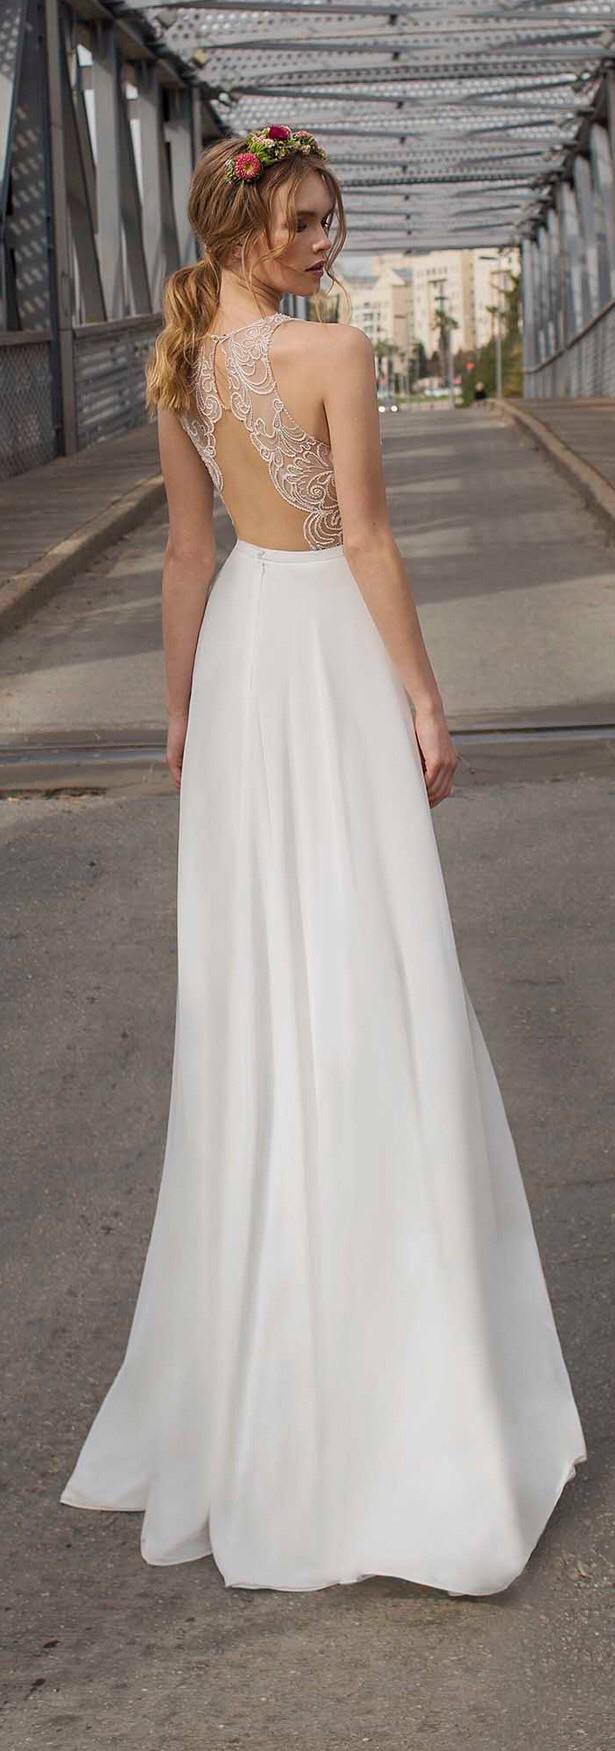 Petite Wedding Dress On 50 Off